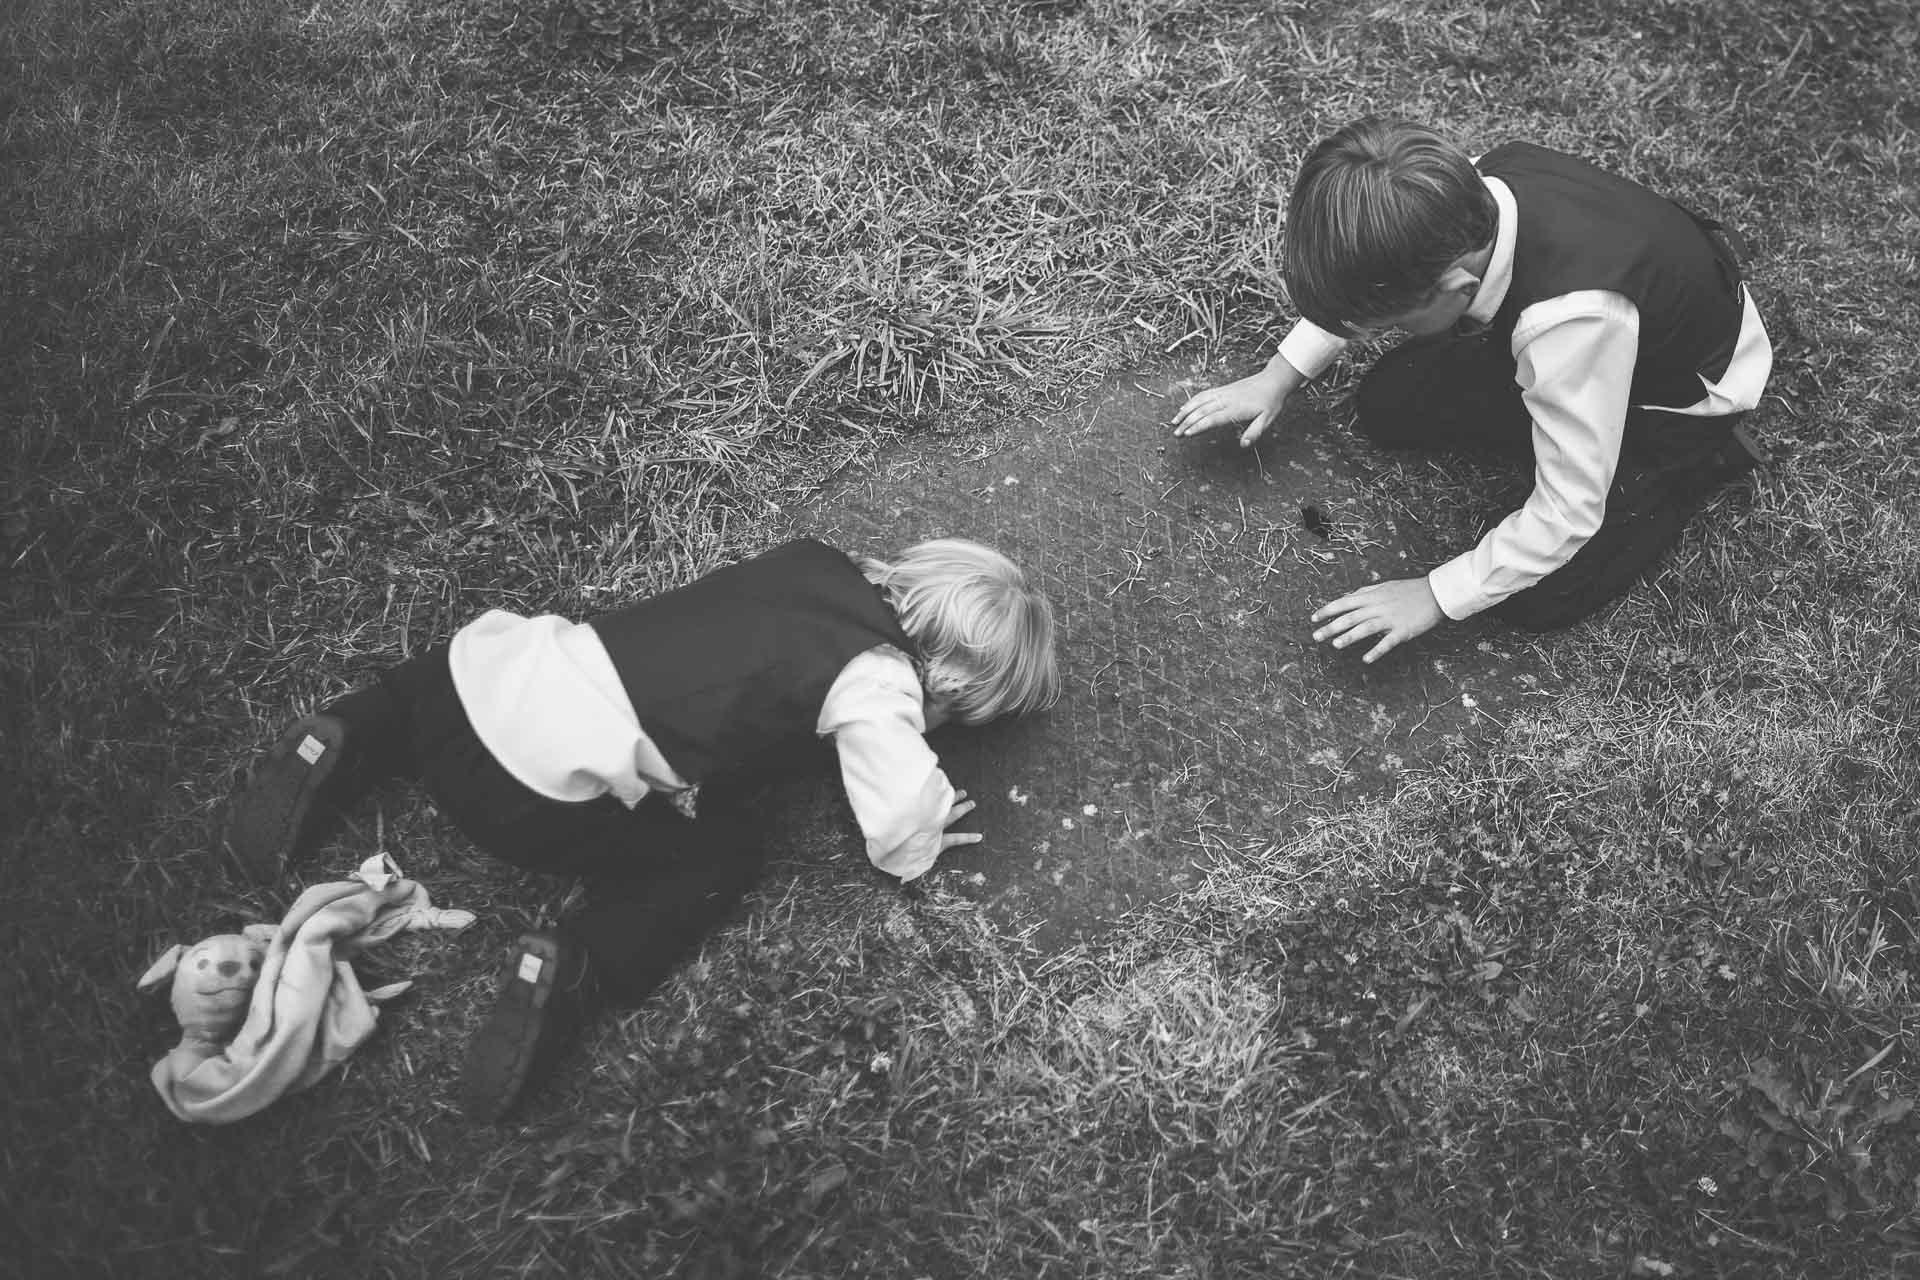 winterbourne-medieval-barn-wedding-photography-emma-andrew-68